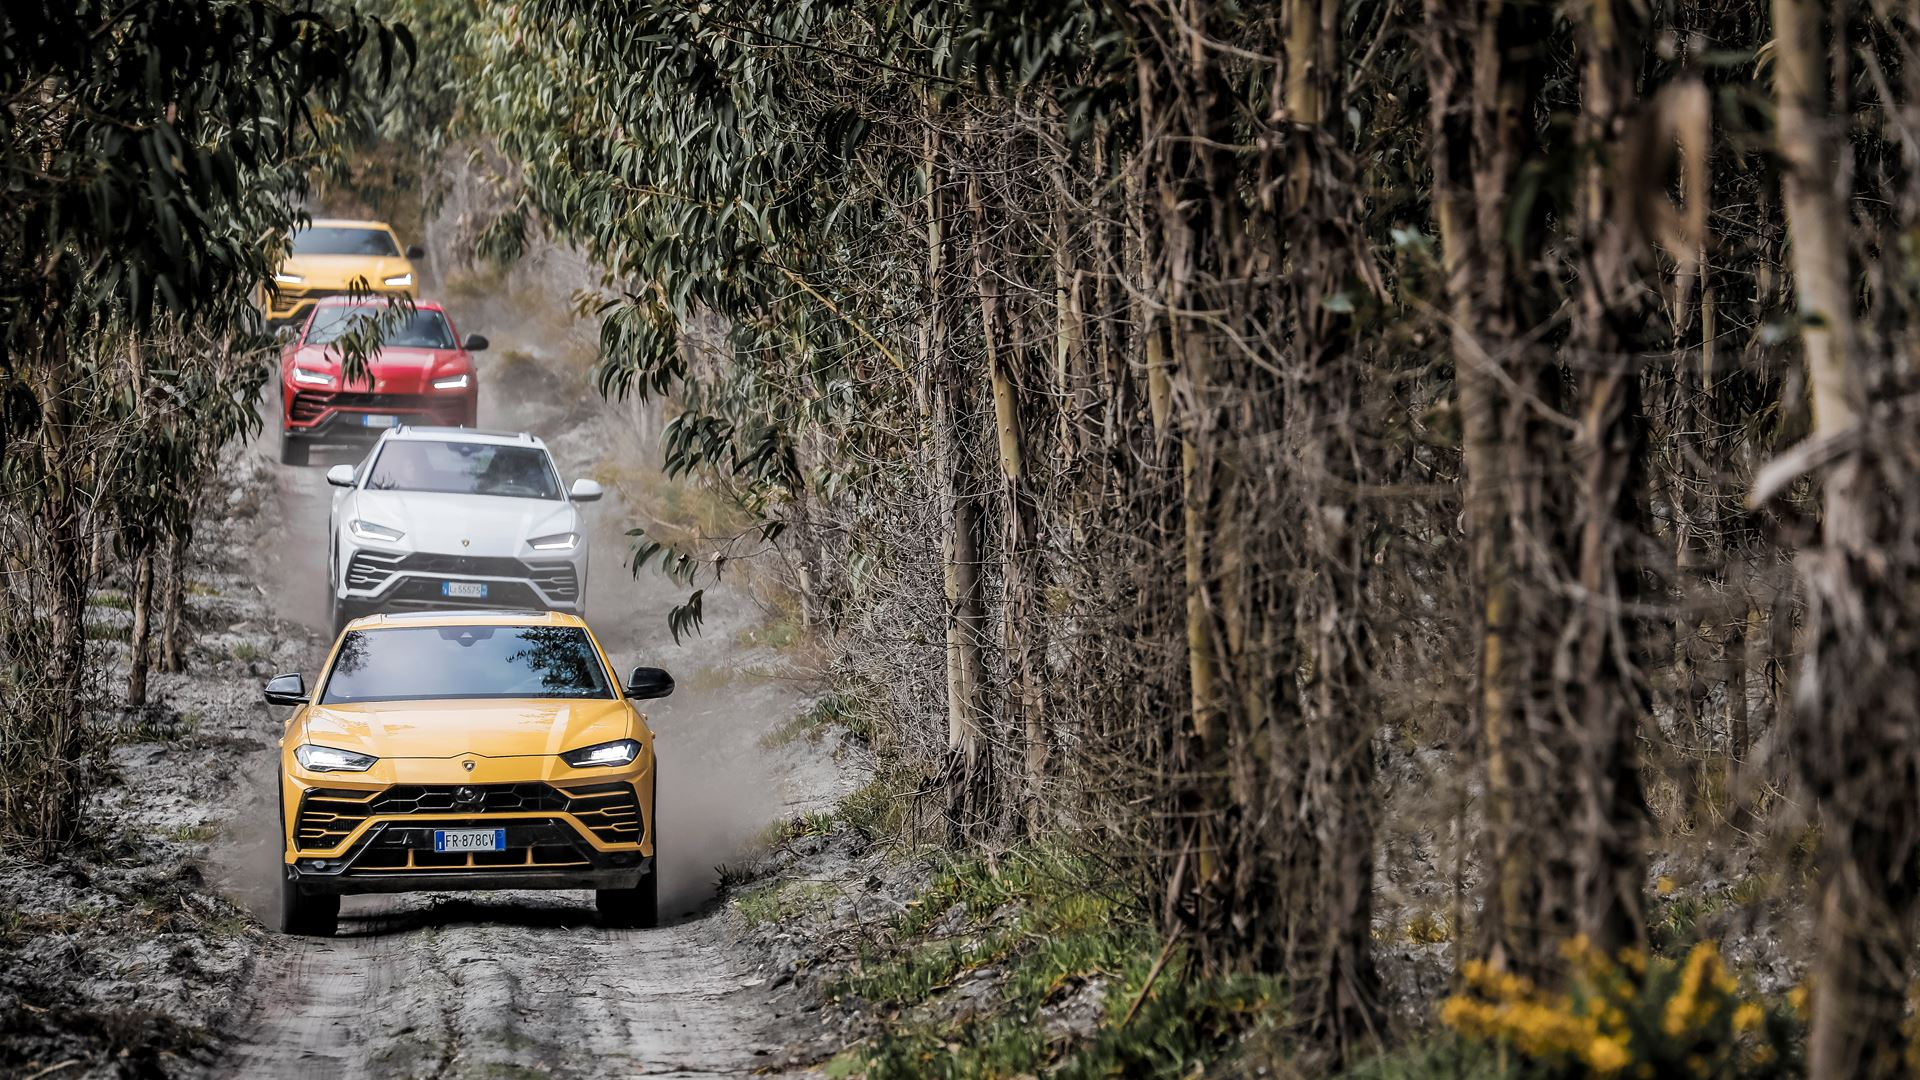 Automobili Lamborghini celebrates the 15,000th Urus - Image 4